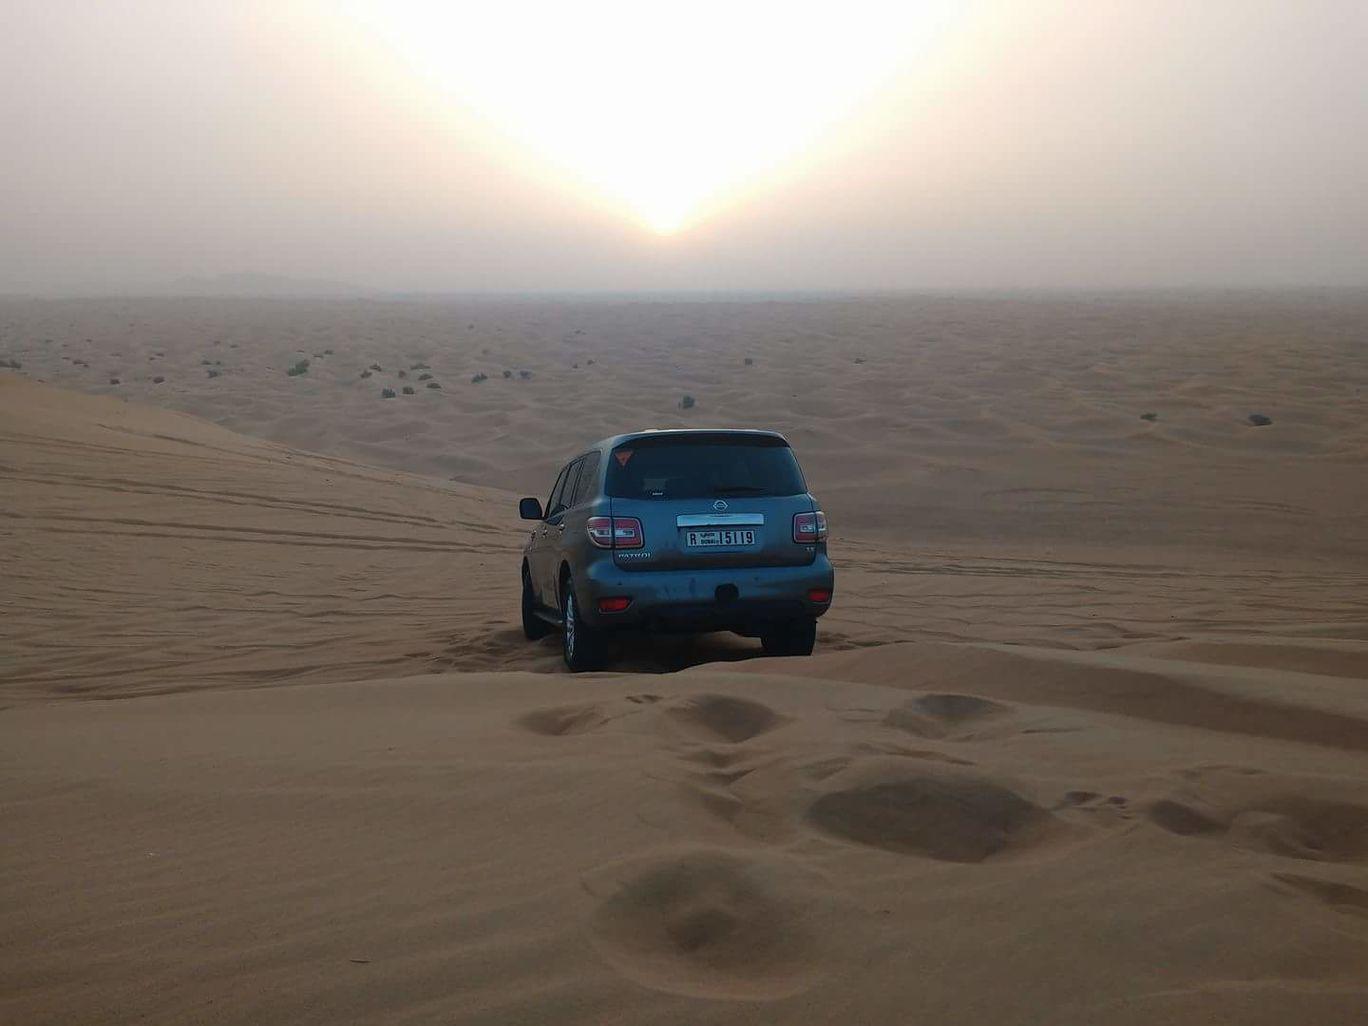 Photo of Desert Safari Dubai - Dubai - United Arab Emirates By Vicky Demblani